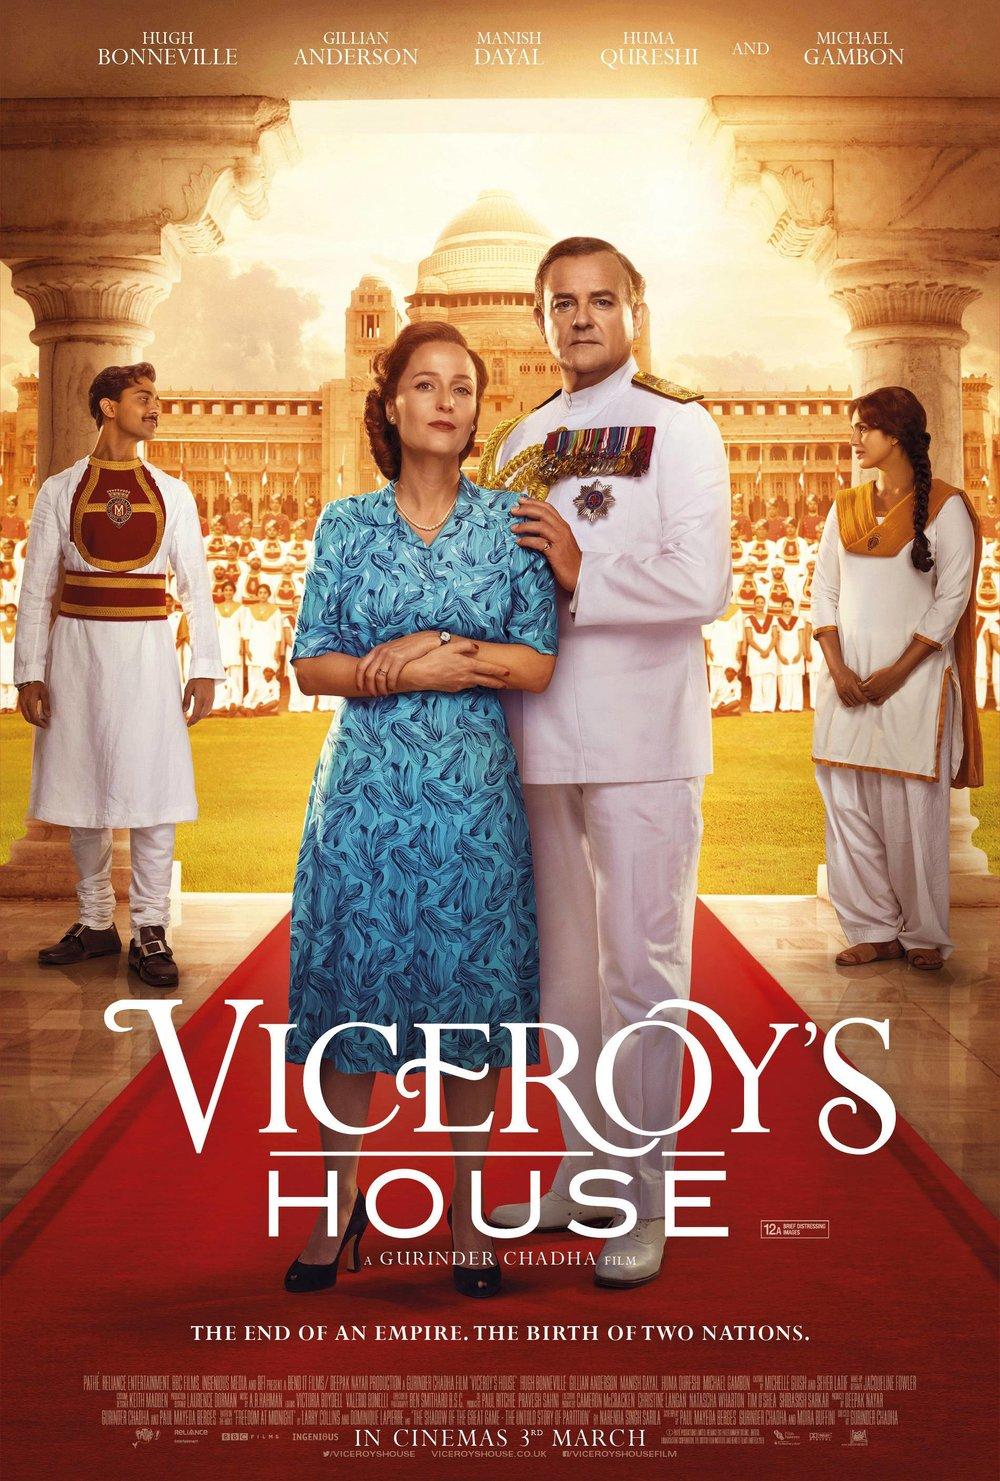 Viceroys-House-Poster-2.jpg